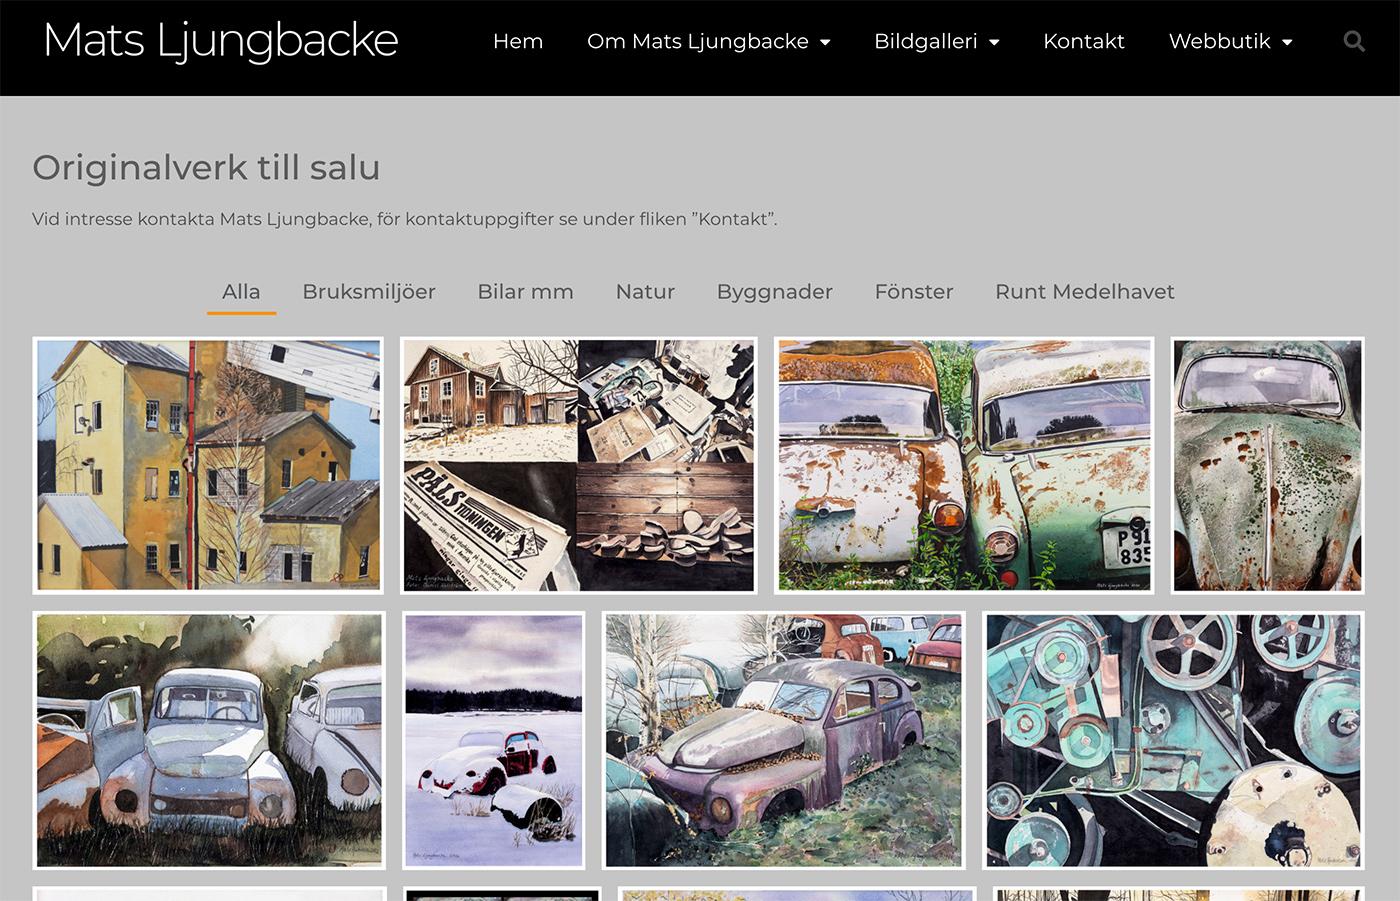 Mats Ljungbacke hemsida